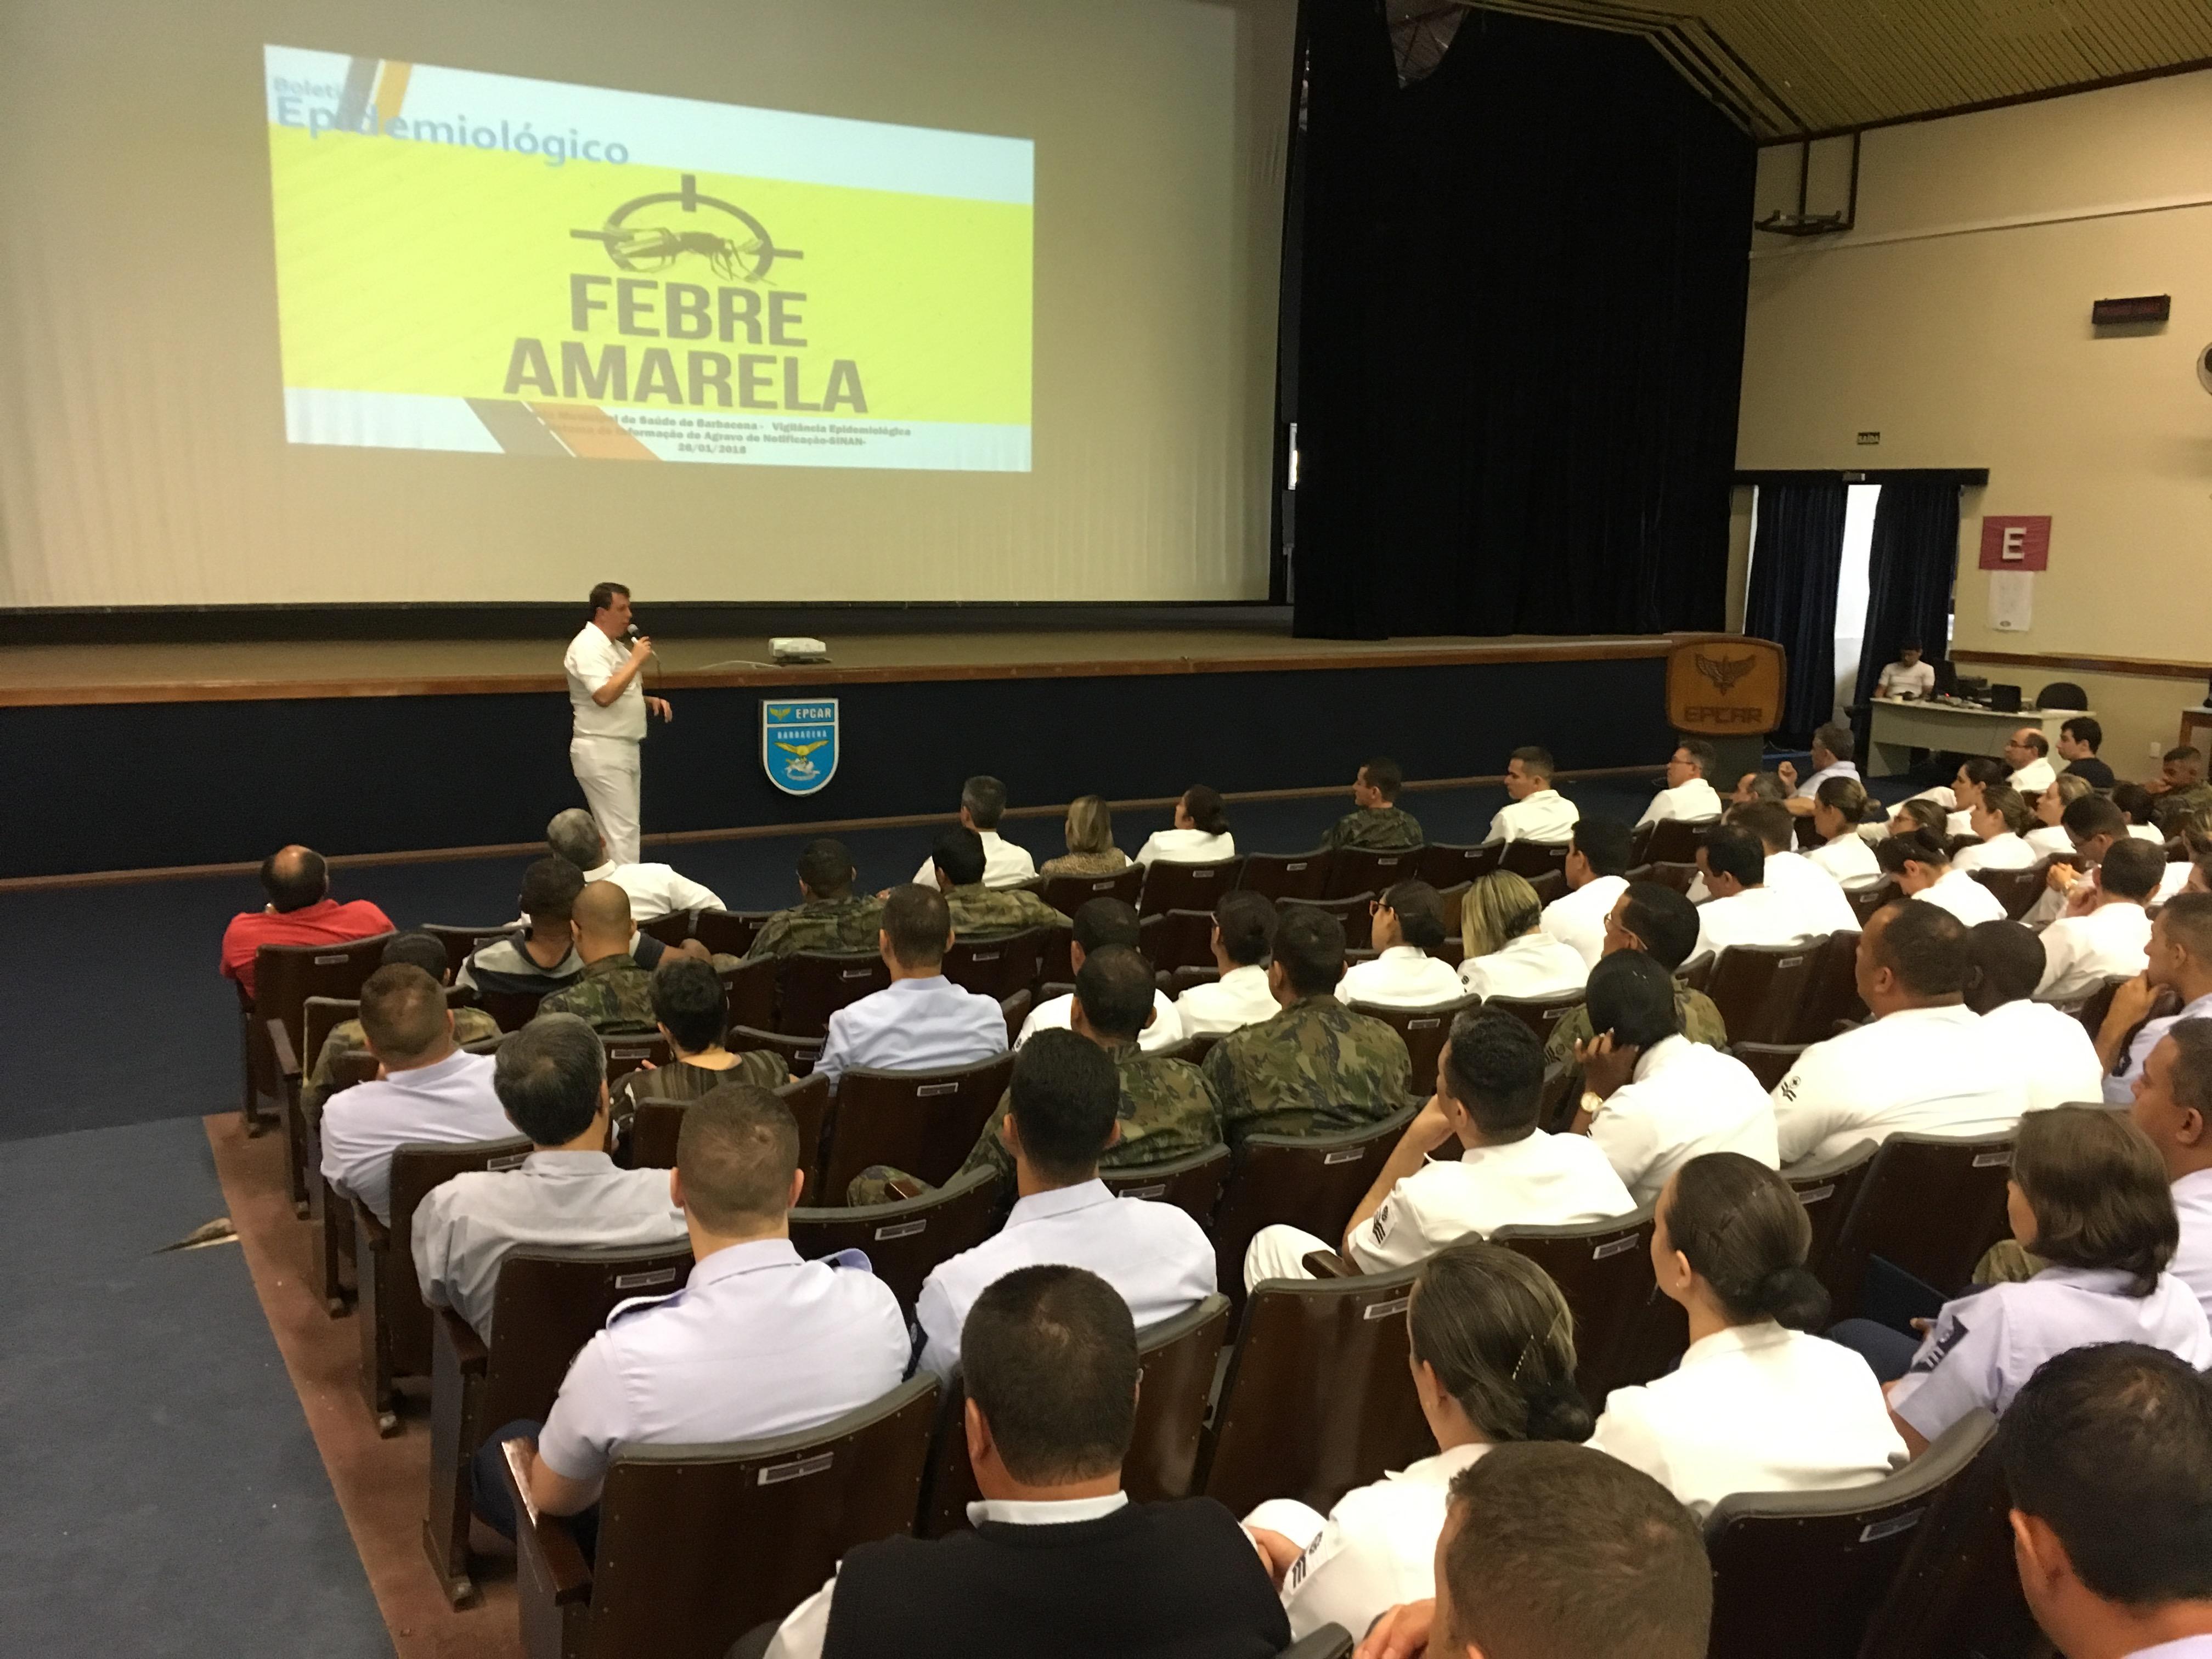 Palestra sobre febre amarela esclarece dúvidas dos militares